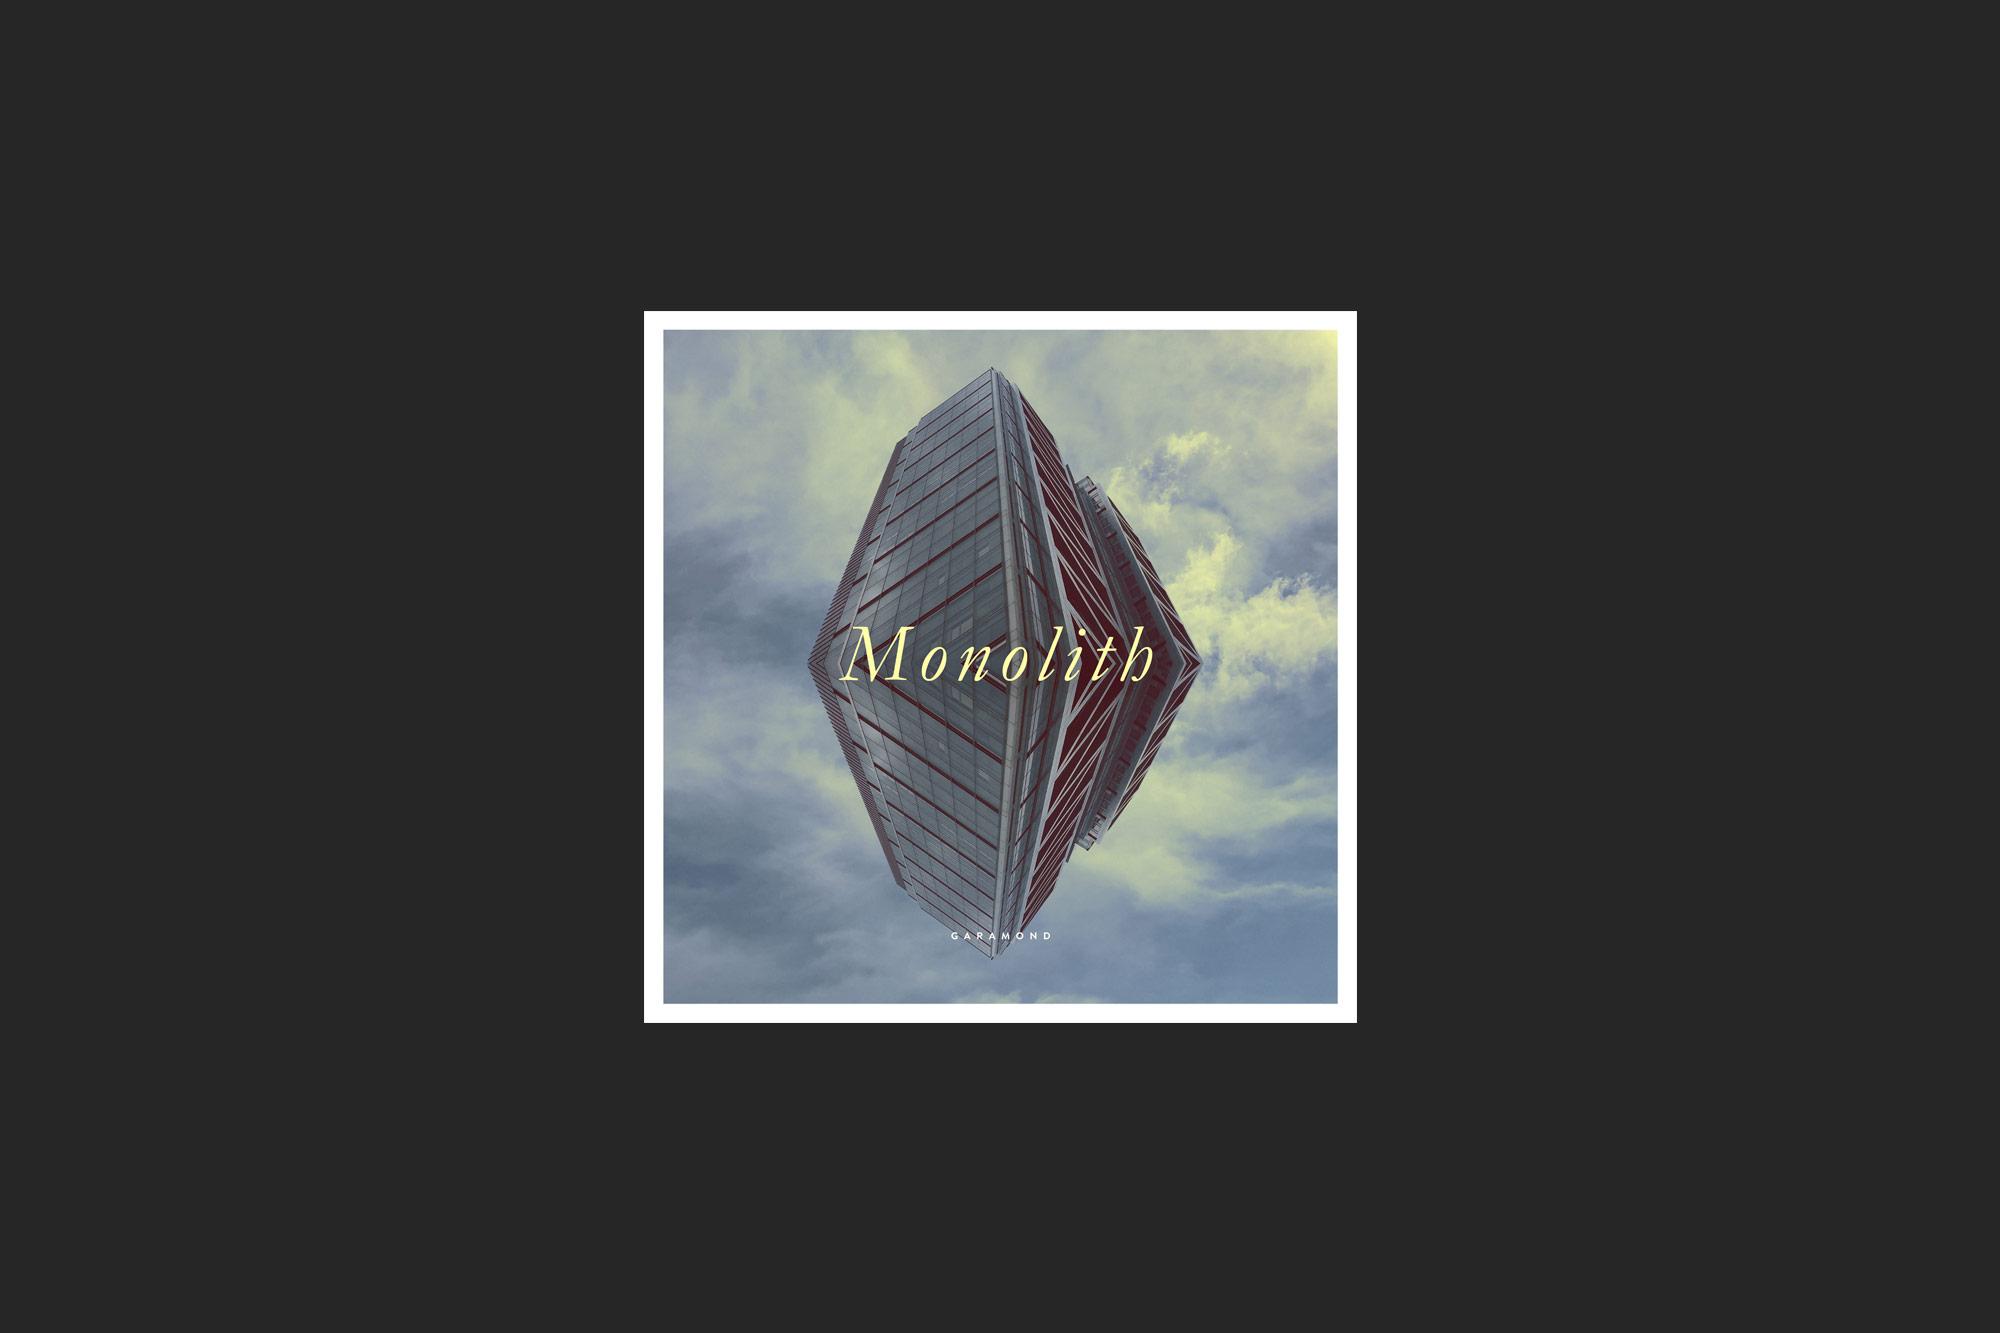 gareth-paul-jones-studio-music-design-garamond-music-monolith-ep-cs-02